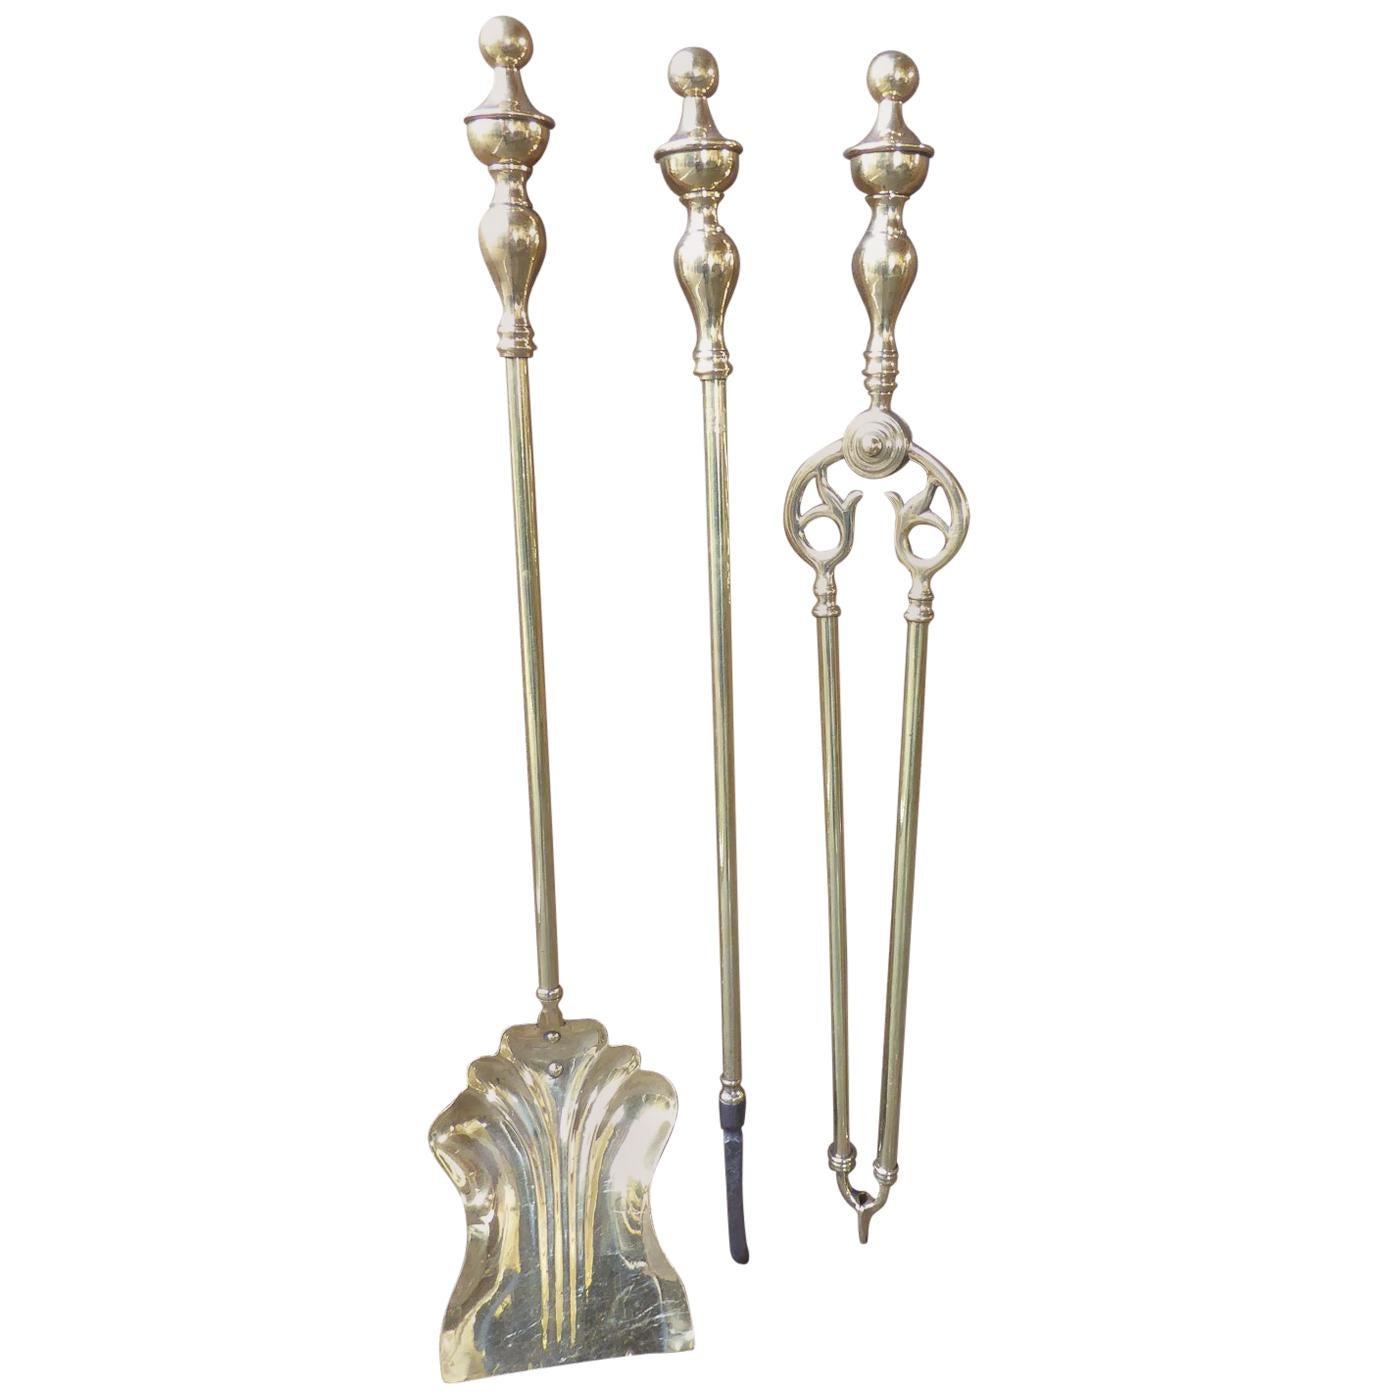 English Polished Brass Victorian Companion Set or Fireplace Tool Set